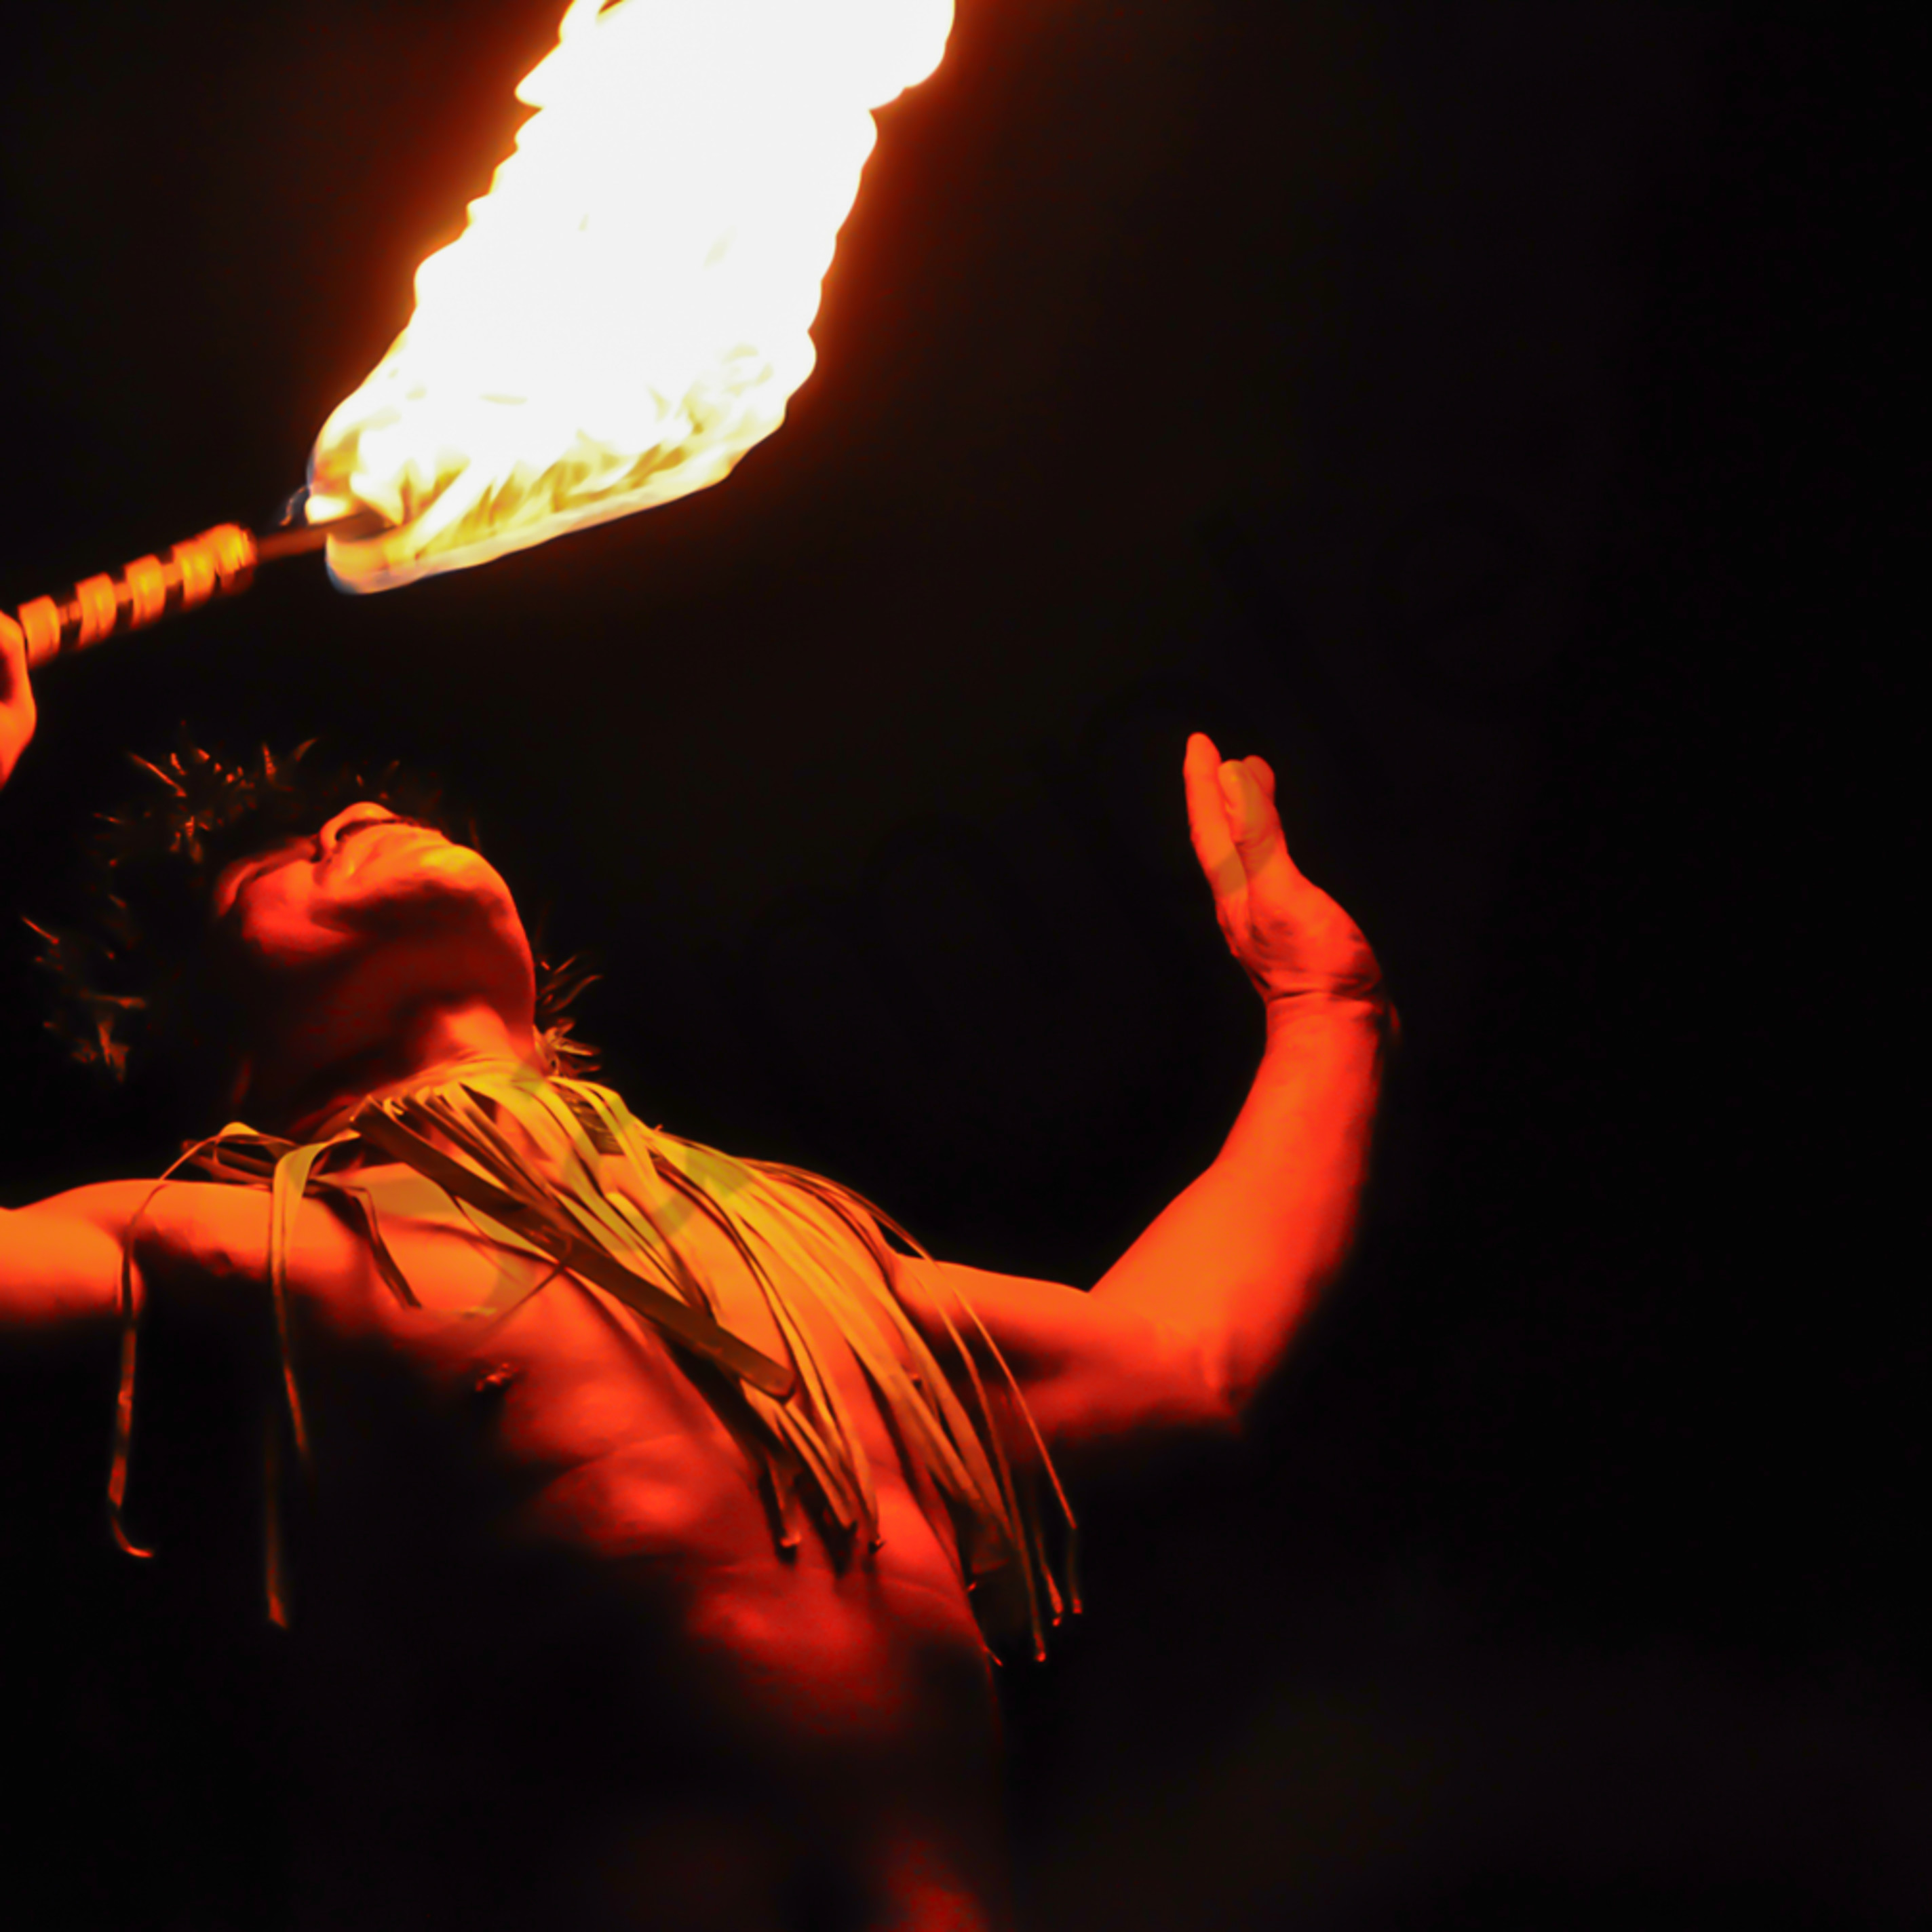 Flame eater dsc 4334 832 ppodcr